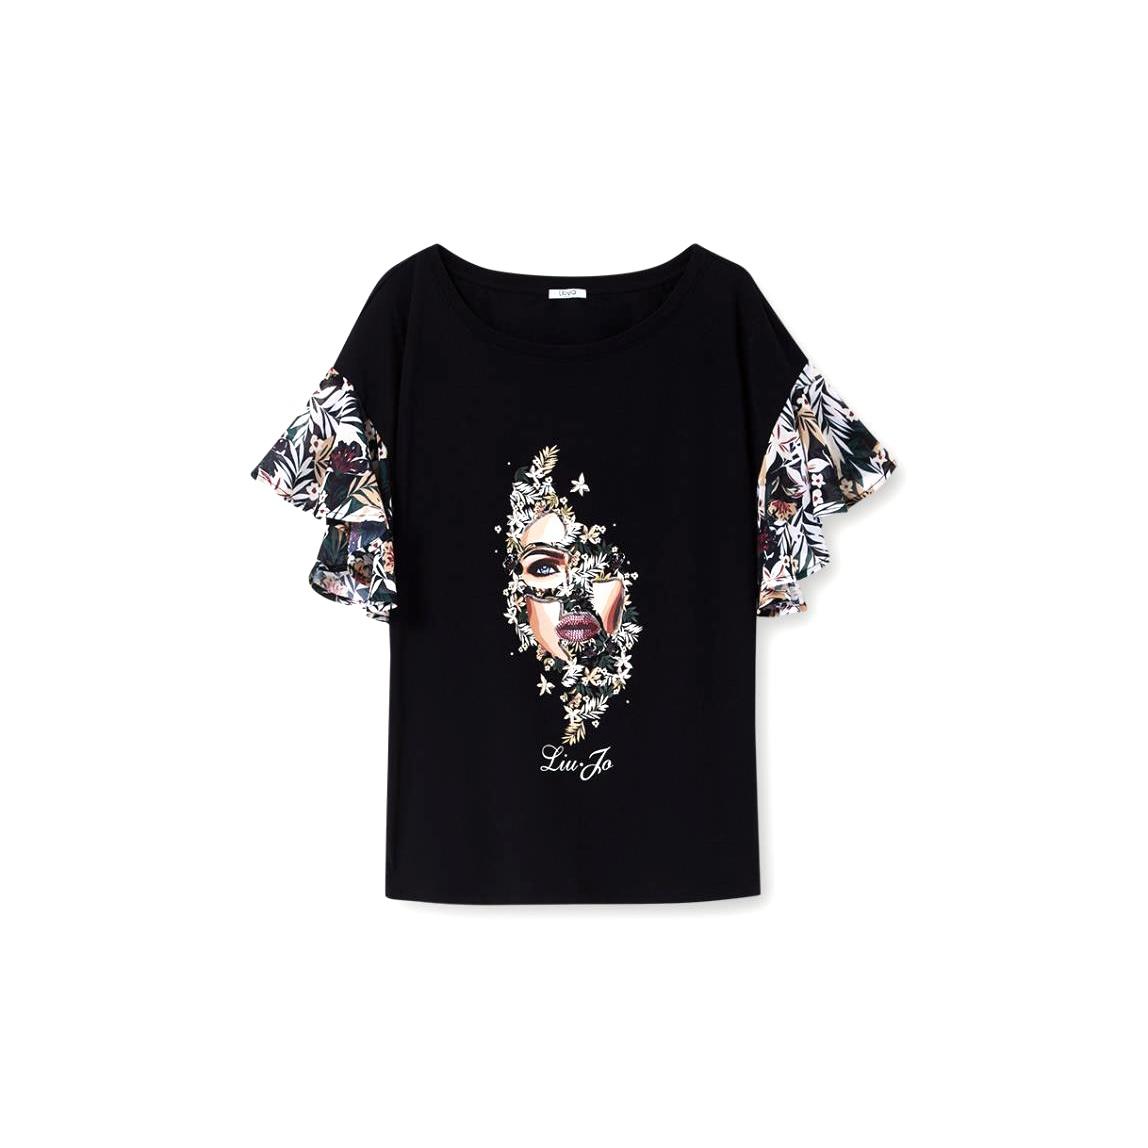 T-Shirt con volants - LIU JO